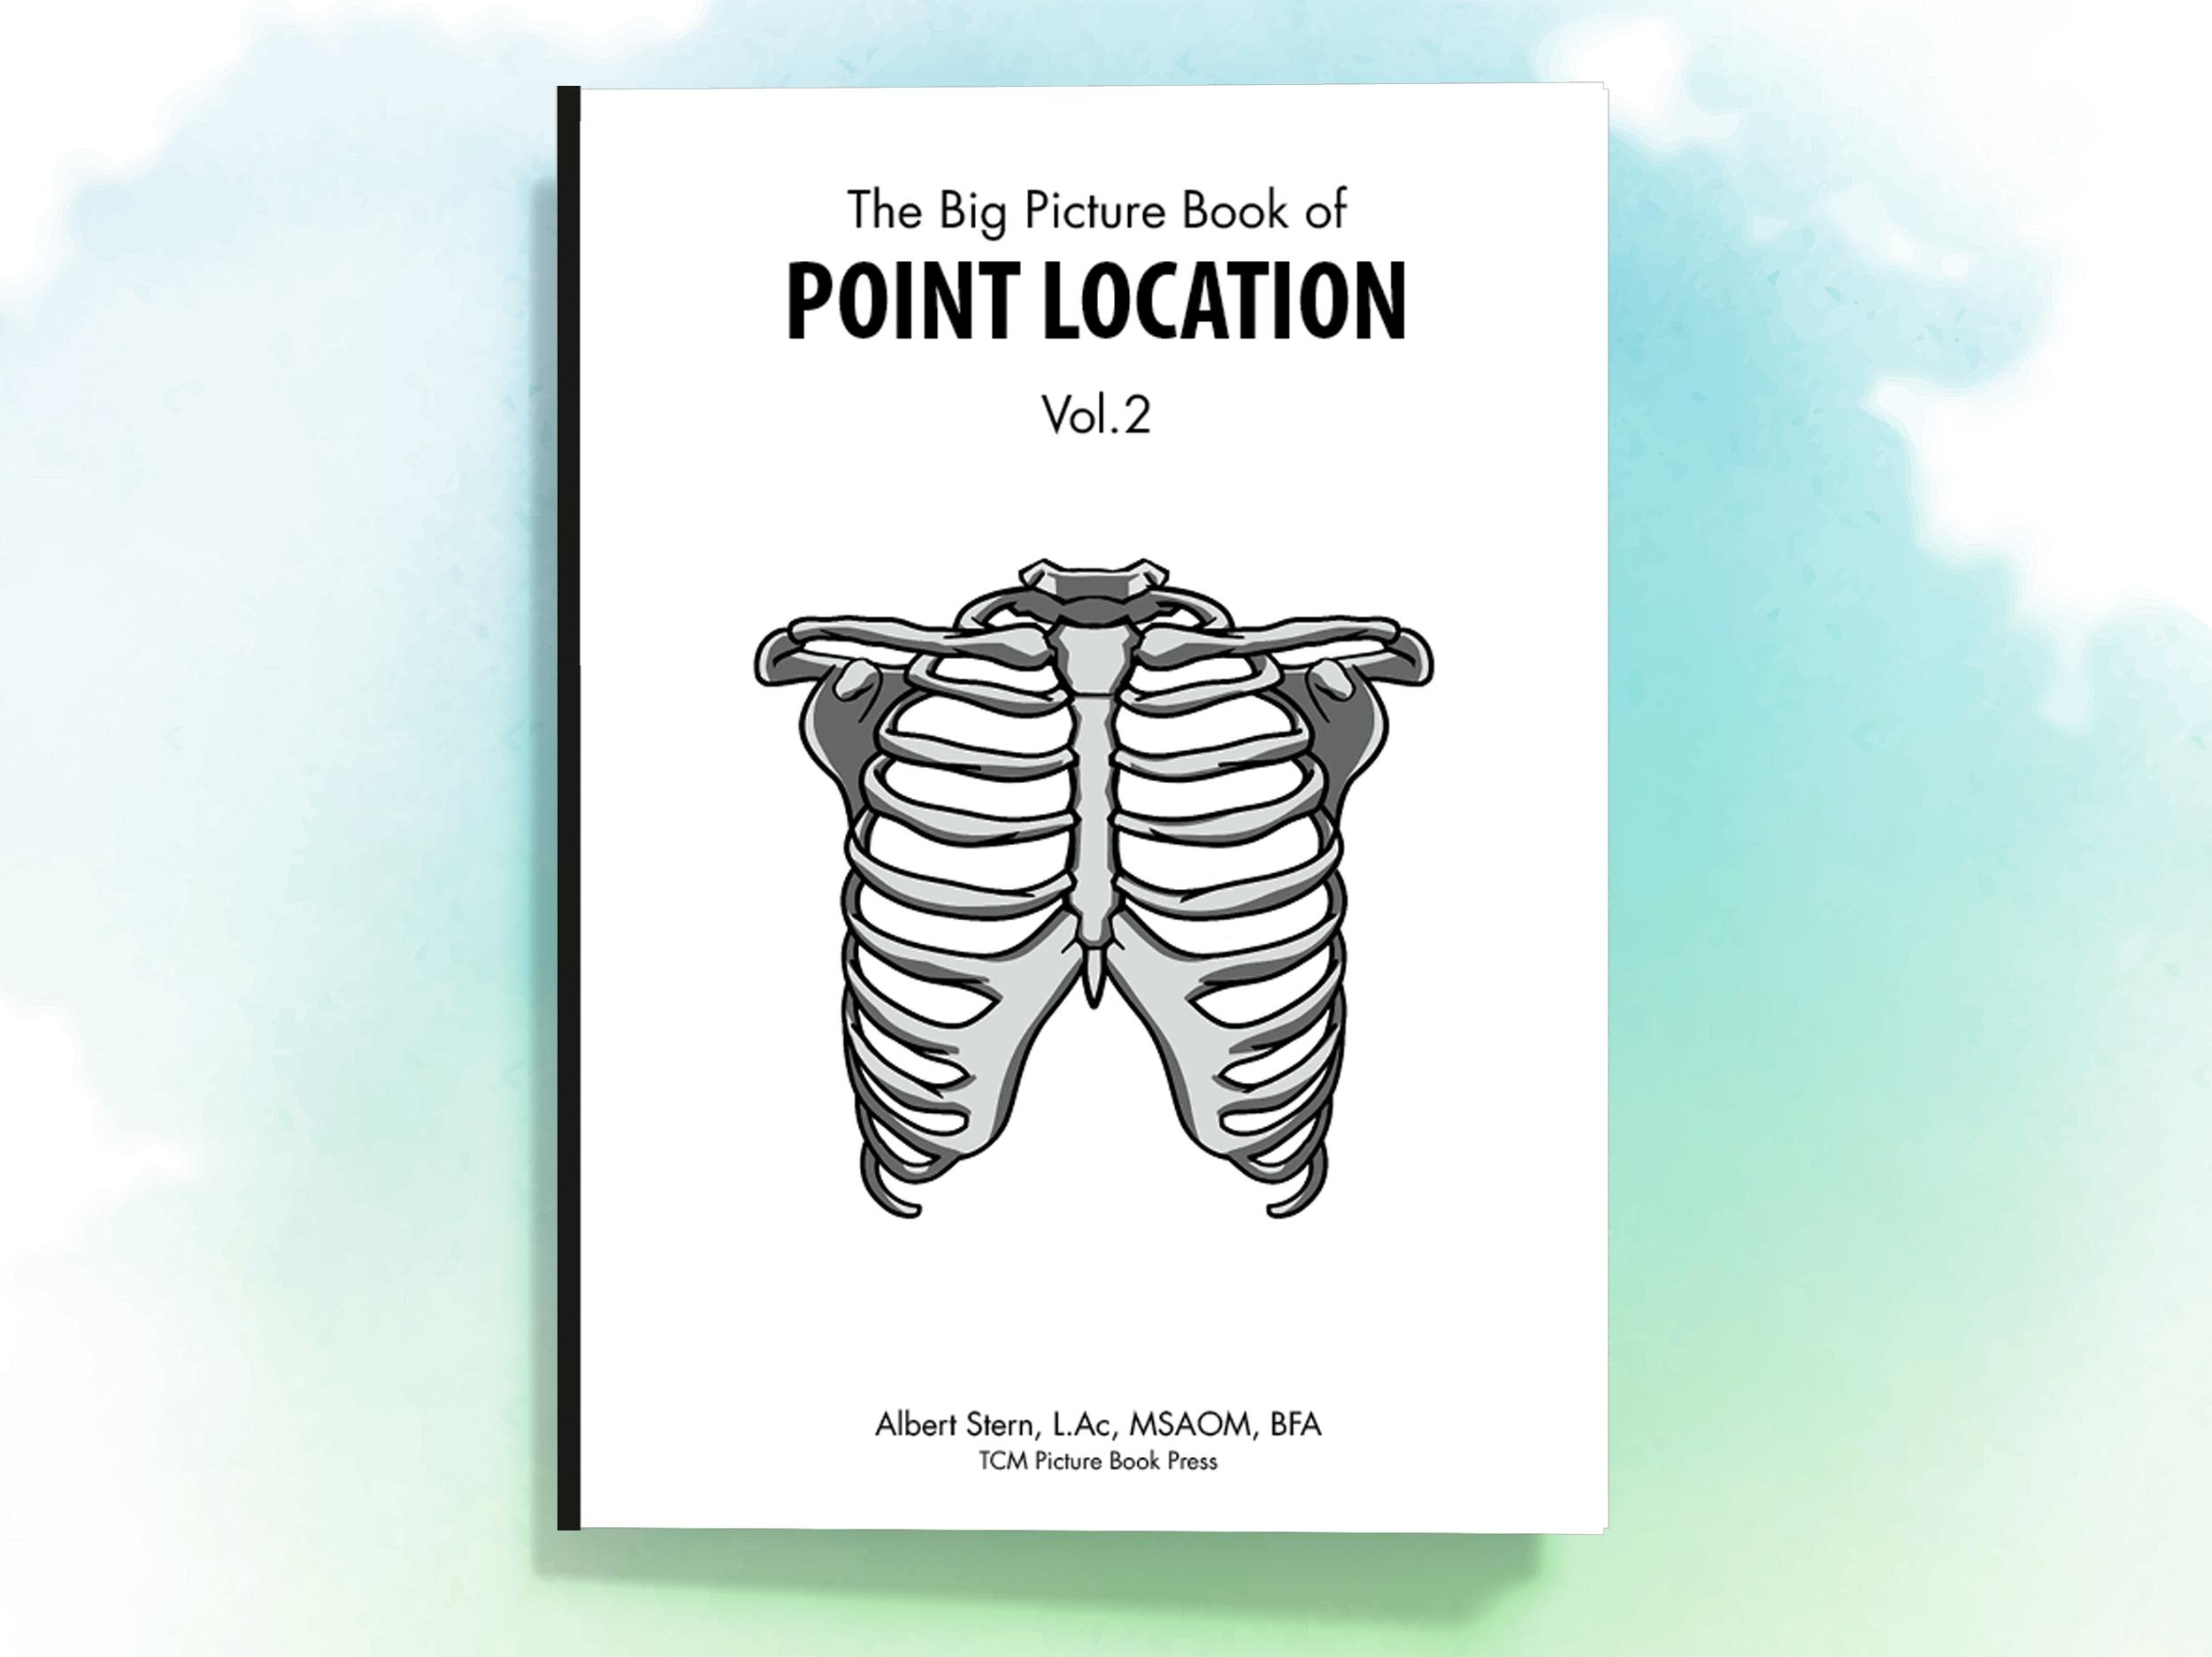 Point location Vol. 2 -